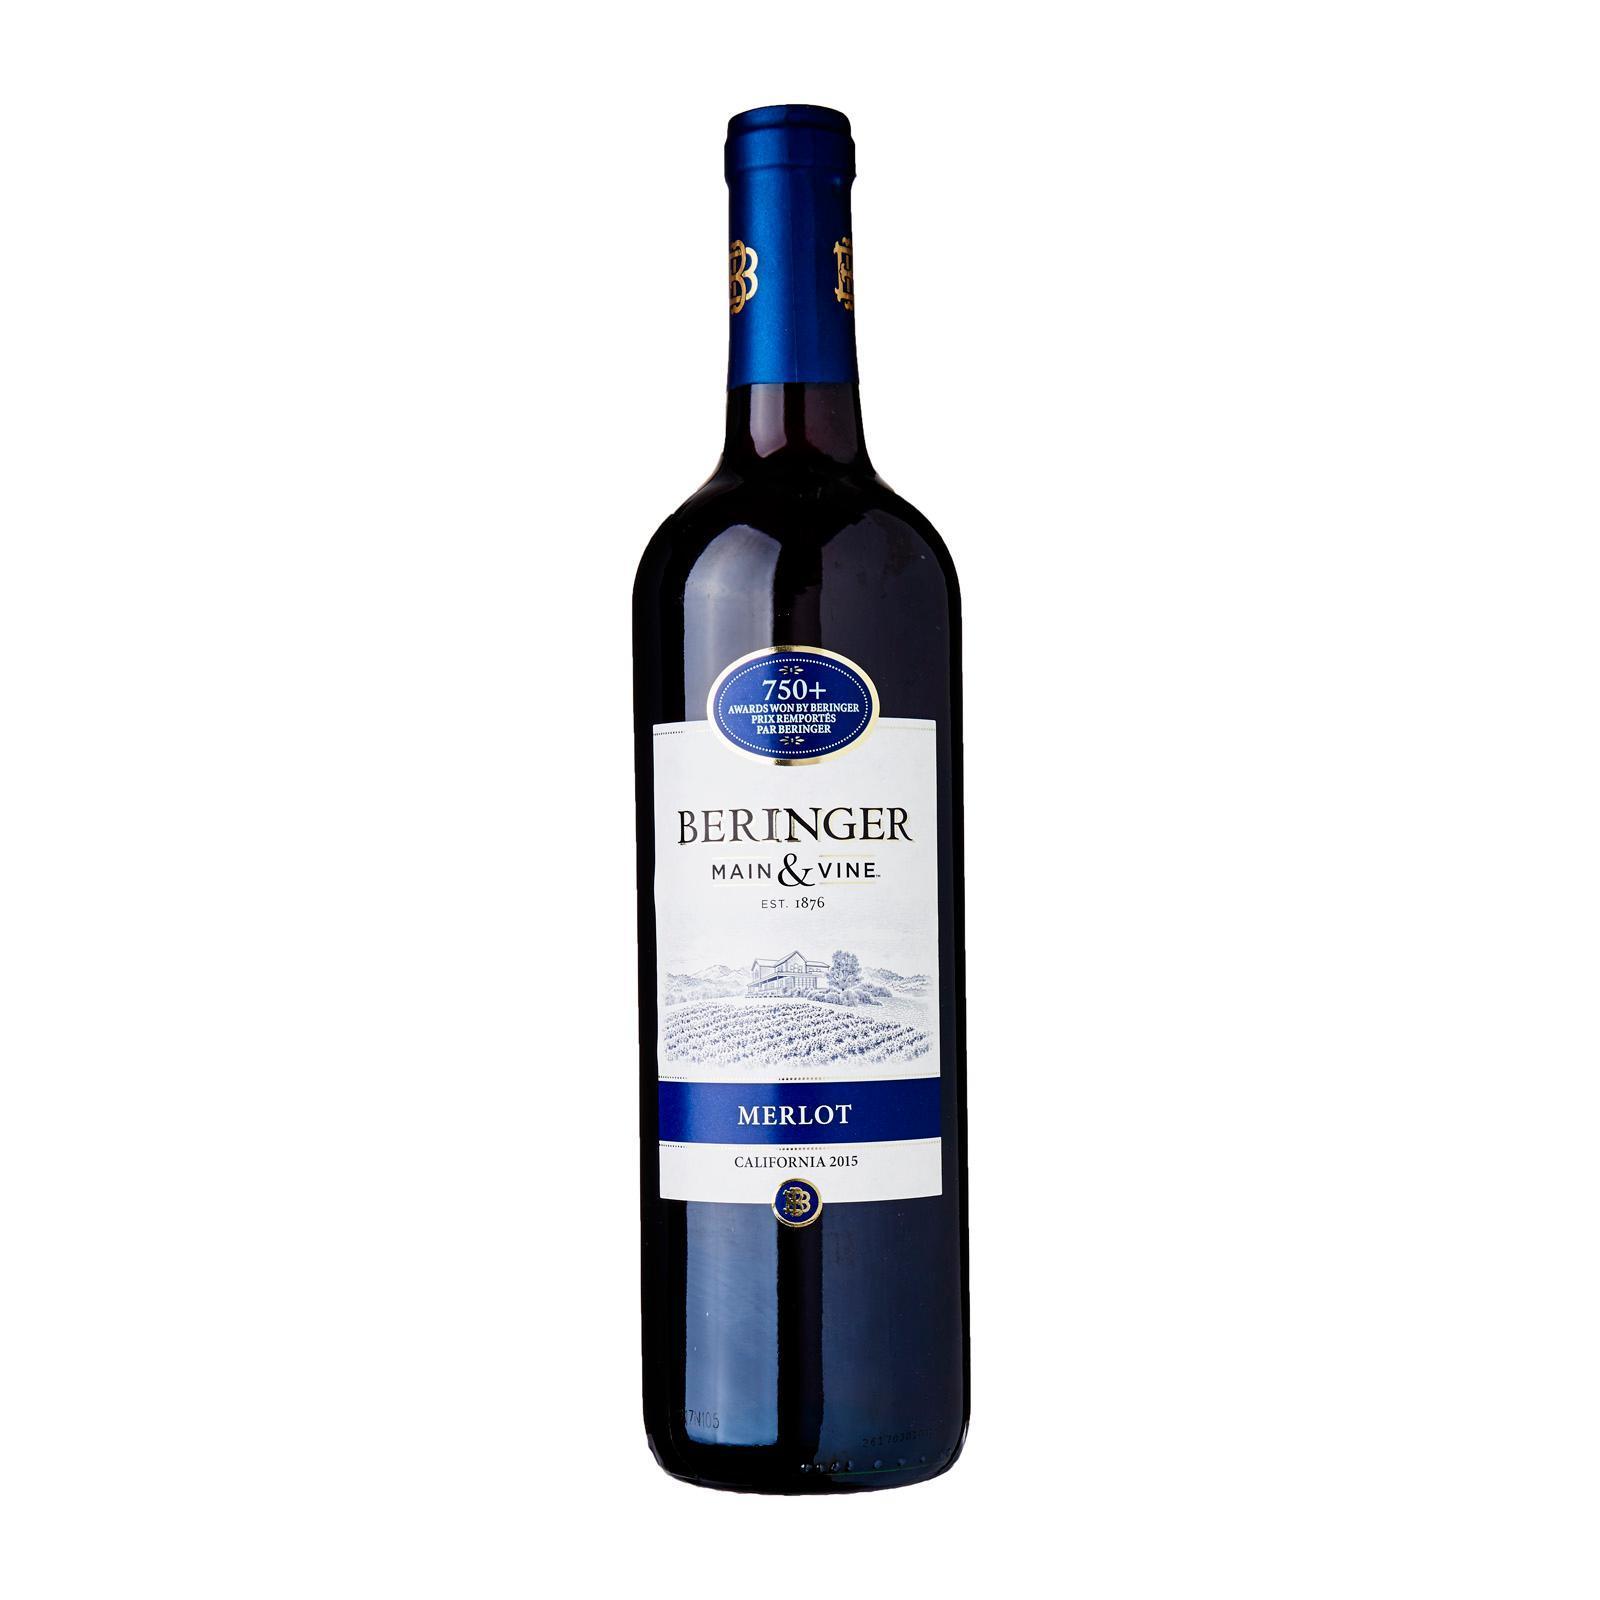 Beringer Main And Vine Merlot Blackcurrant Flavour